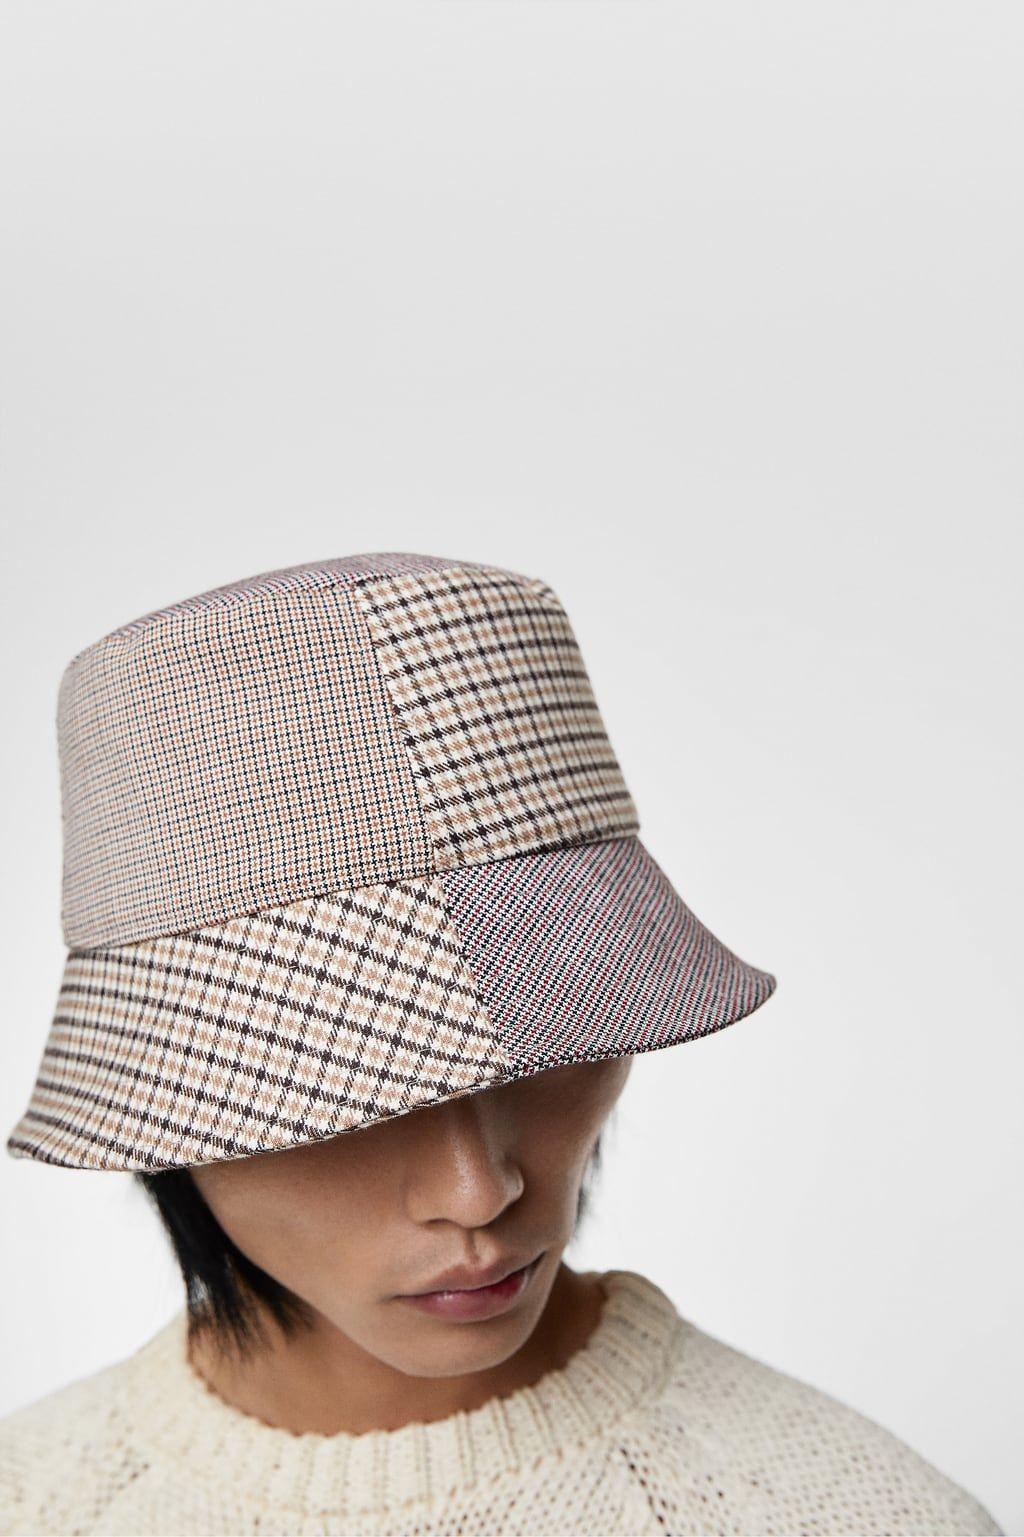 Gorro Lluvia Patchwork Ultima Semana Hombre Zara Mexico In 2021 Fashion Hats Oxfam